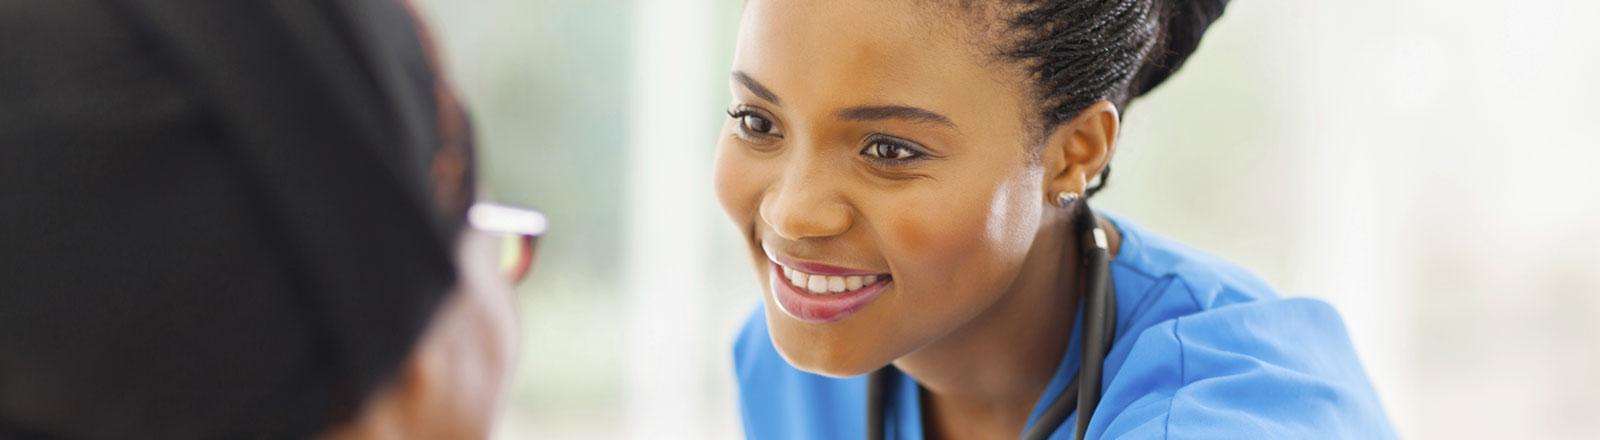 BSN-DNP, Family Nurse Practitioner